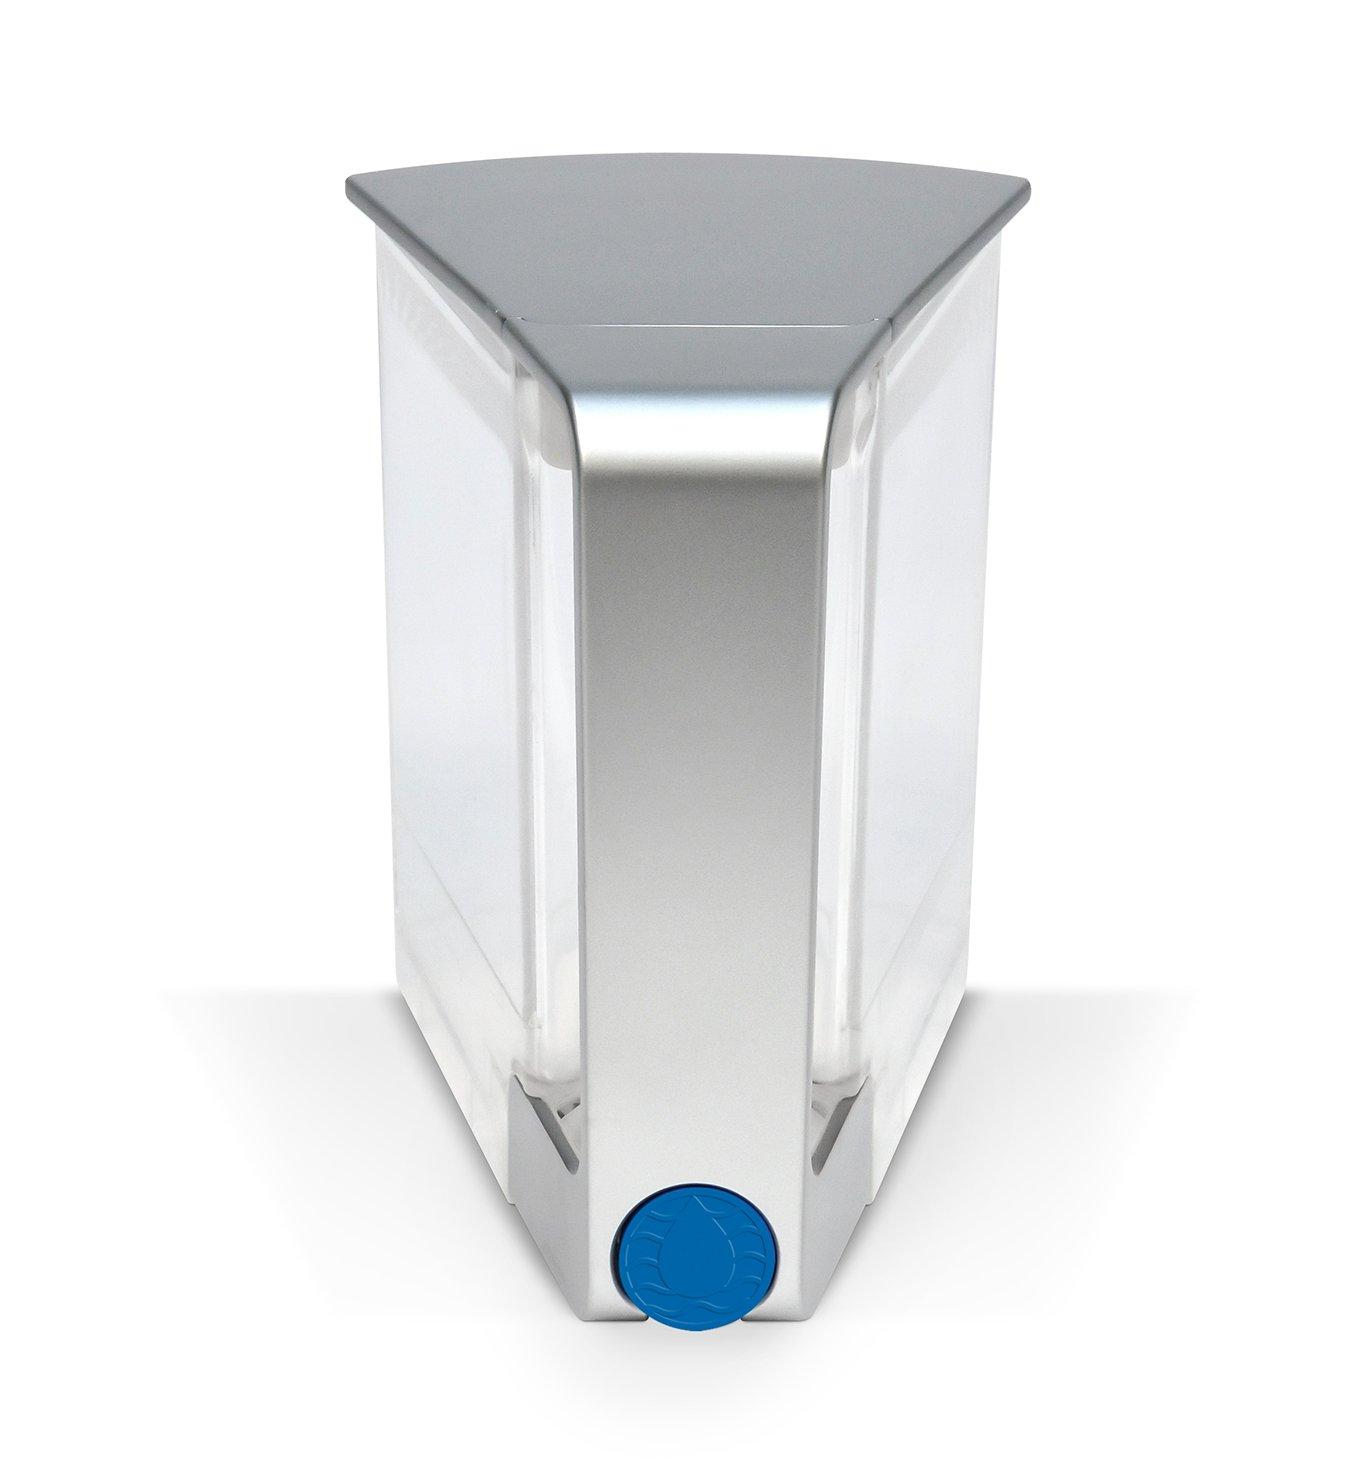 AQUA TRU Additional Clean Water Tank Countertop Reverse Osmosis Water Filter Purification System by AQUA TRU